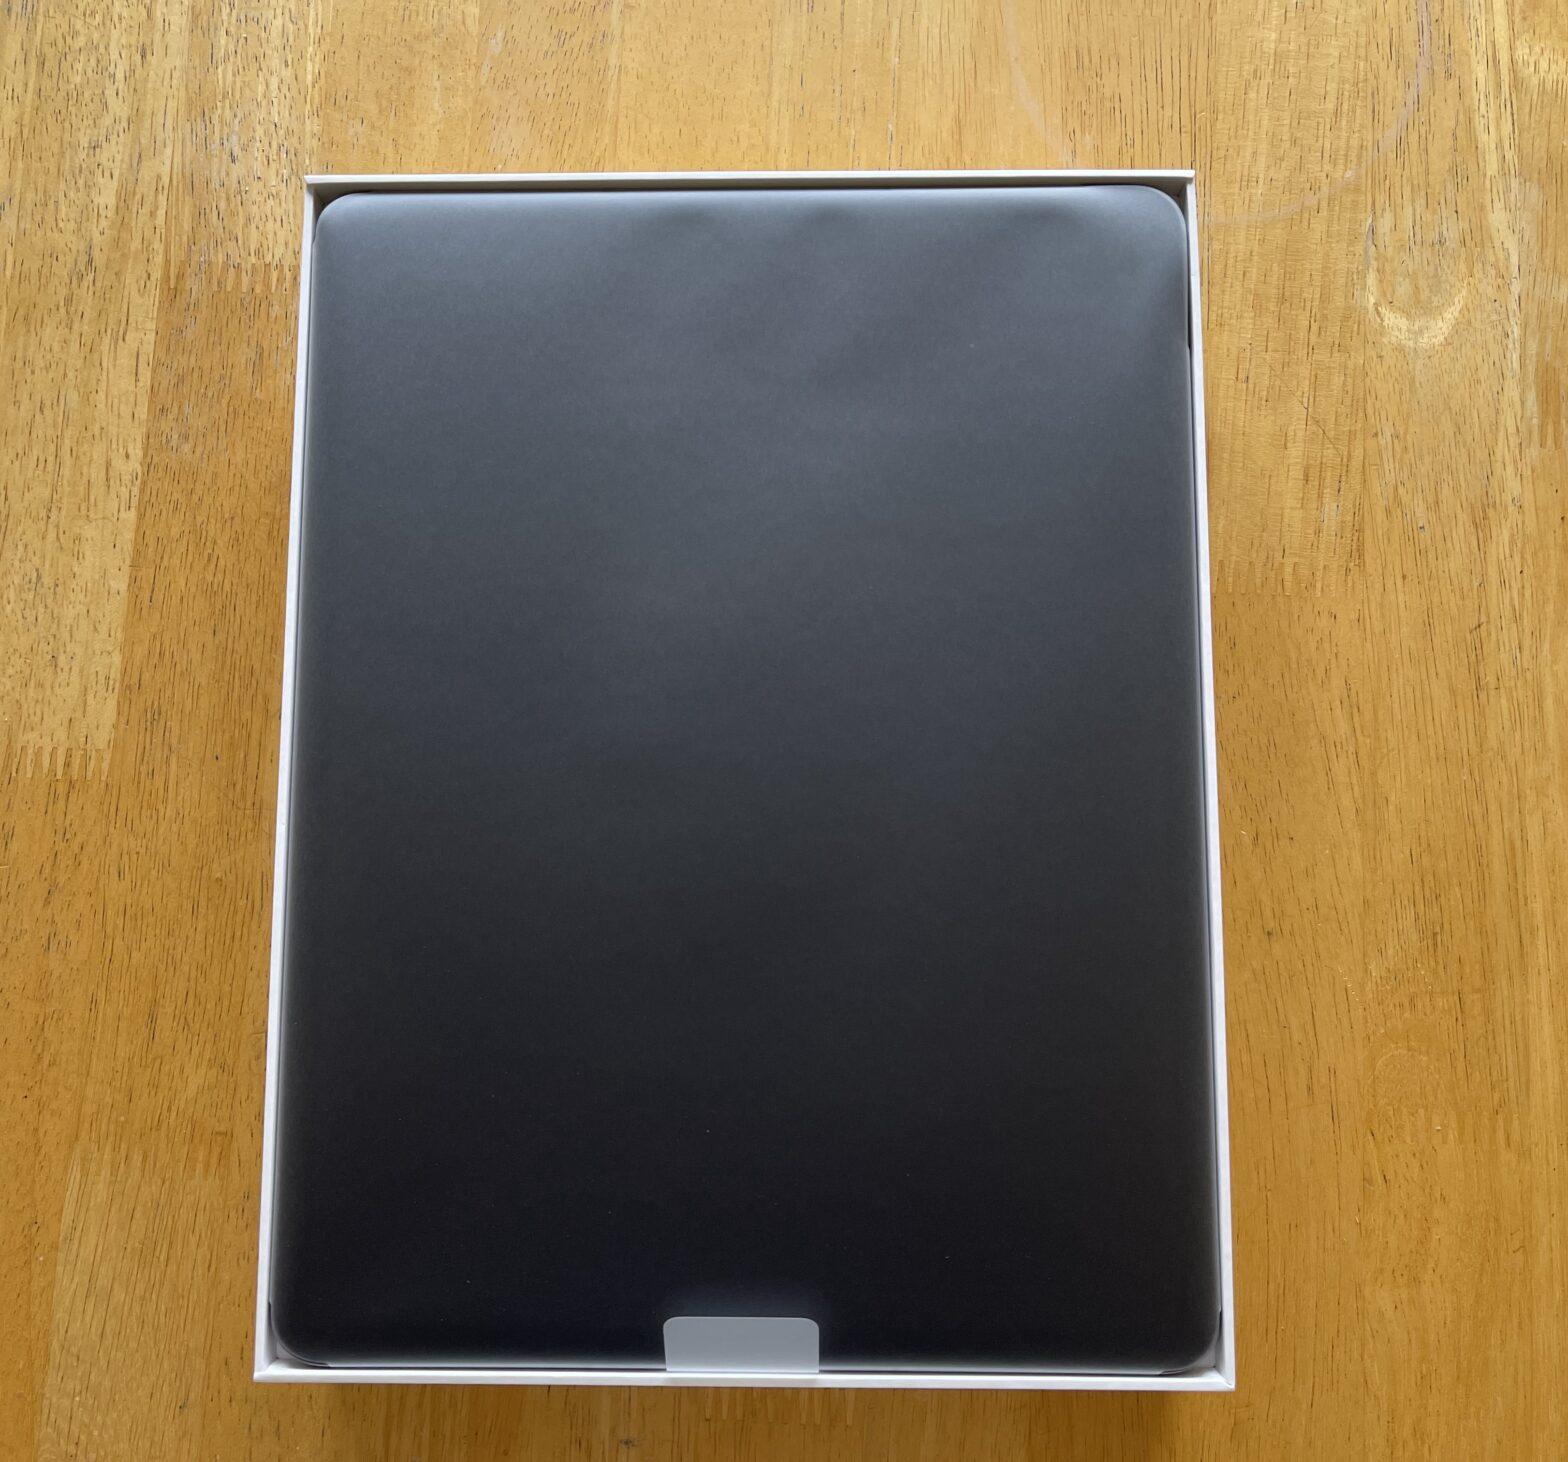 5th Generation iPad Pro in Box